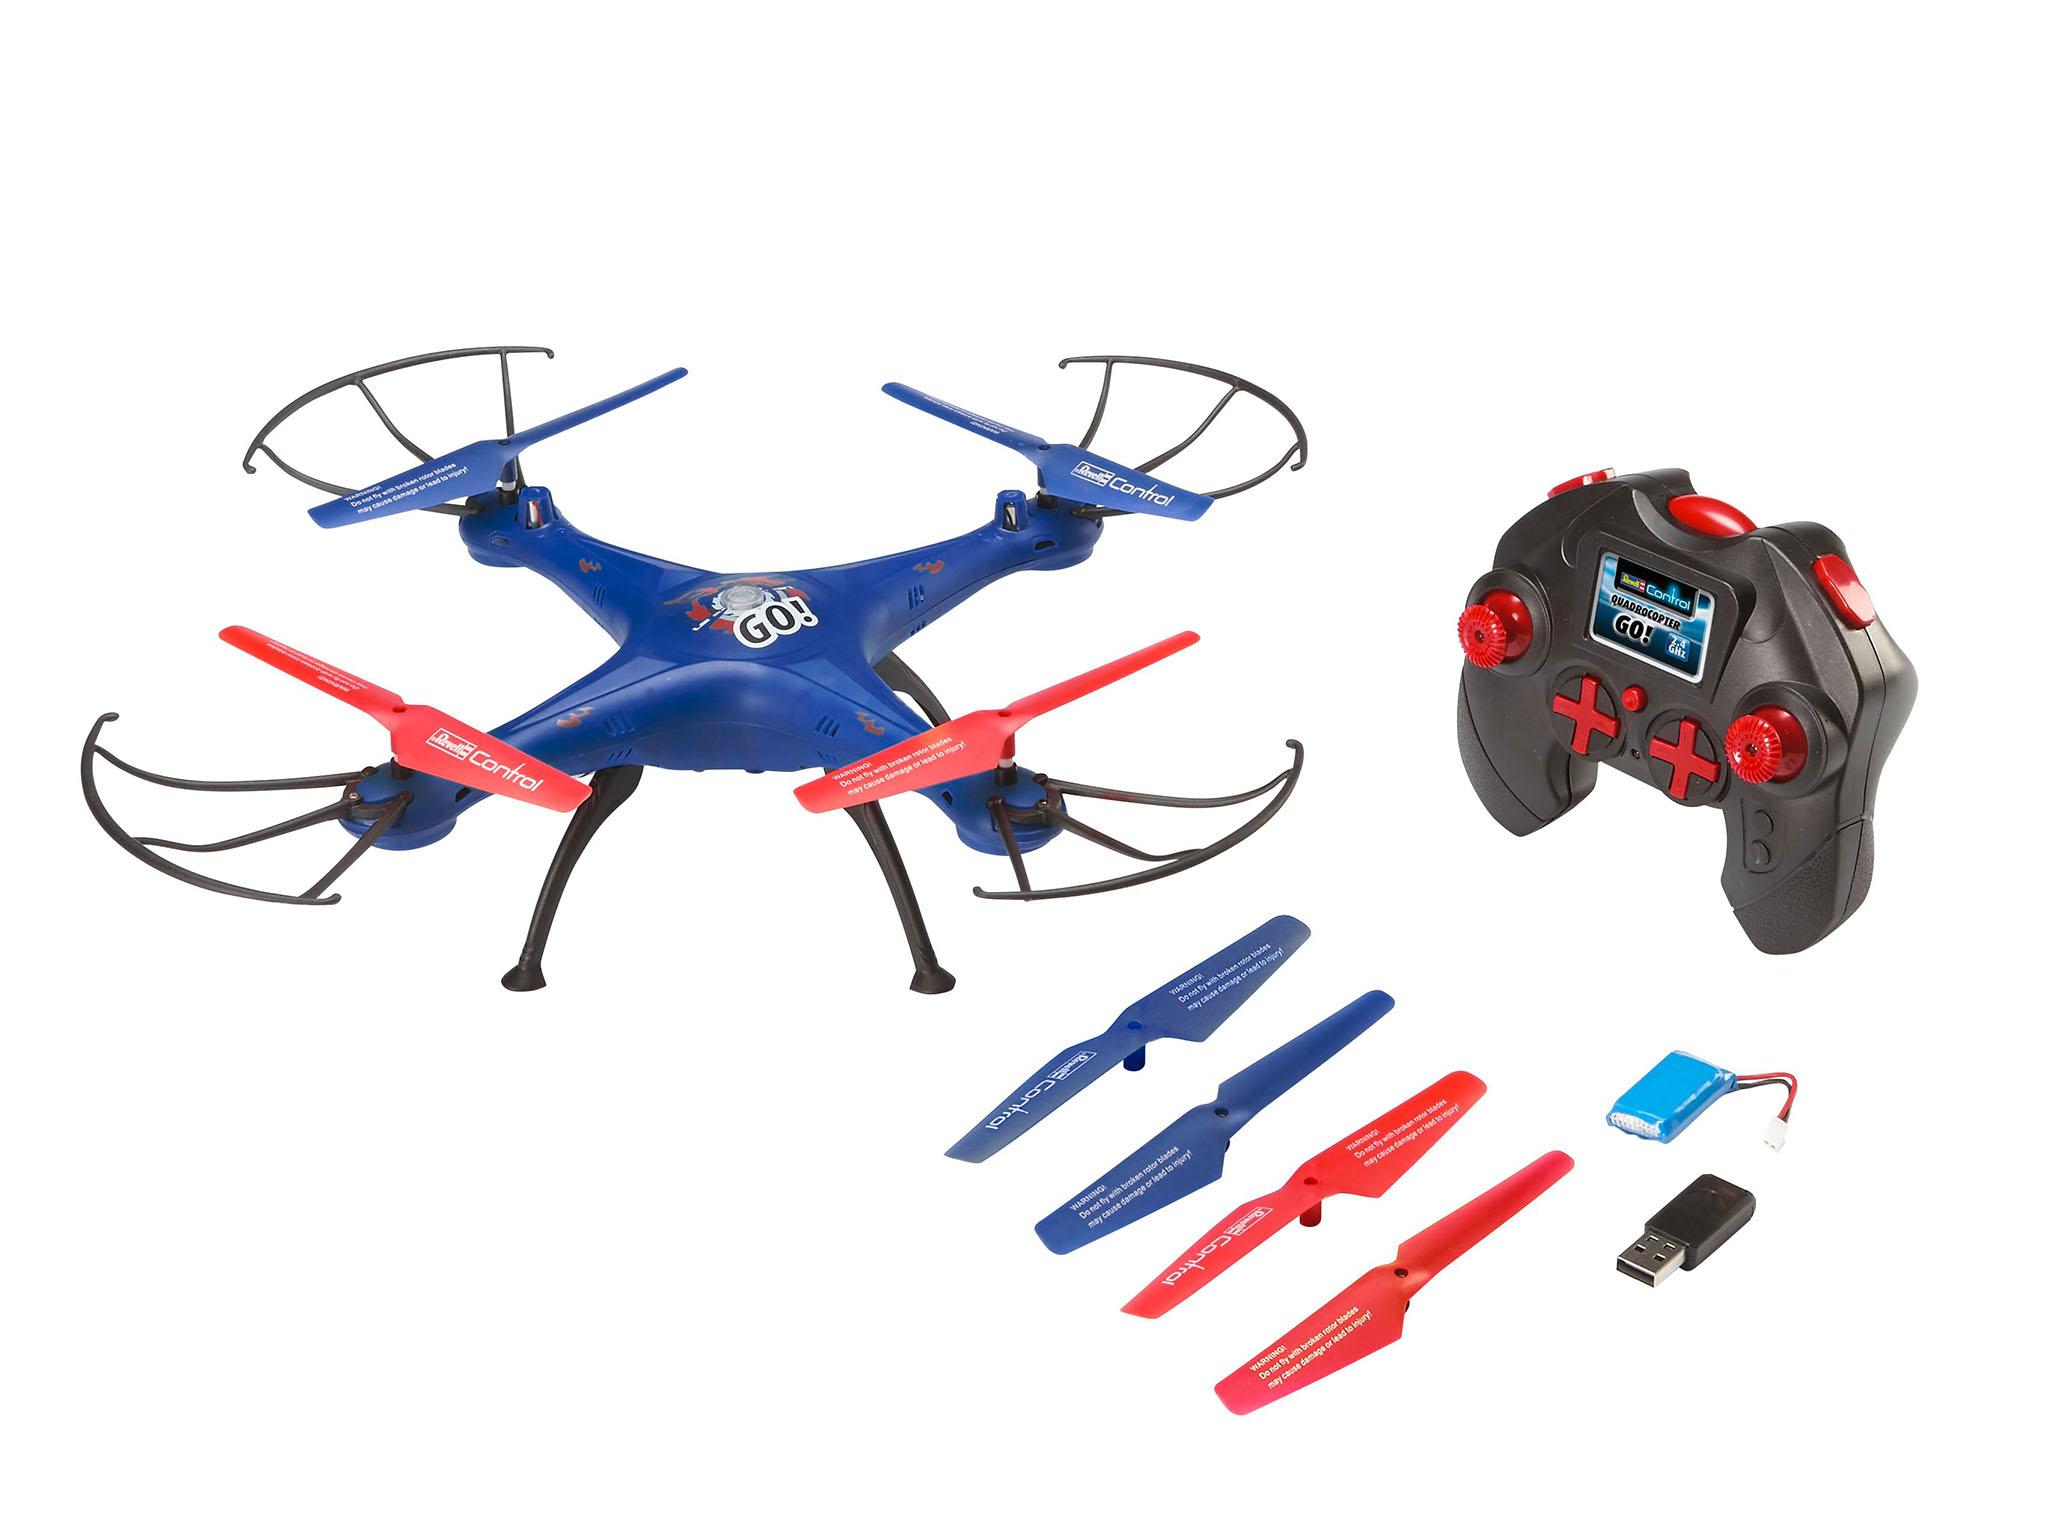 revell quadcopter go. Black Bedroom Furniture Sets. Home Design Ideas